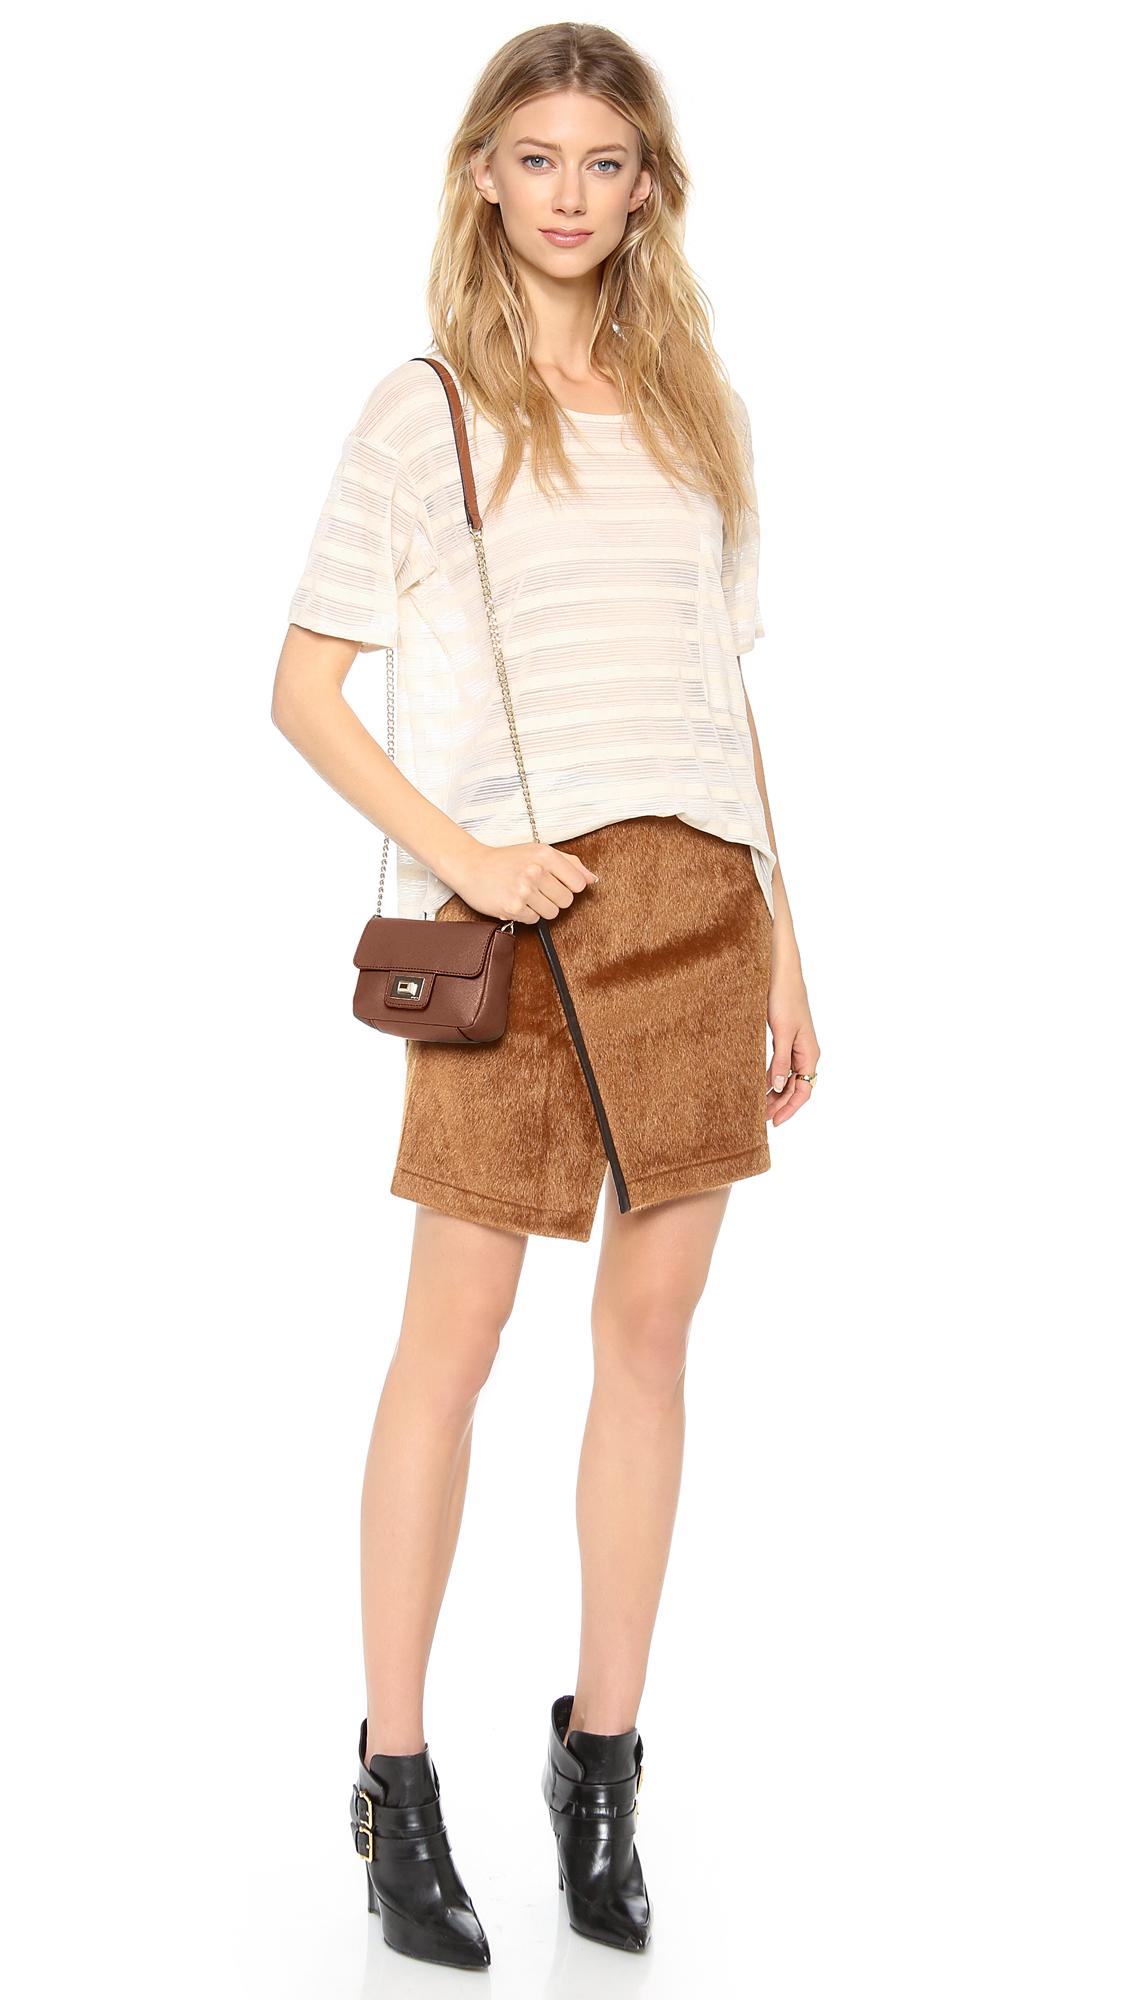 Juicy Couture Sophia Mini Bag  9eb9a9d7509f